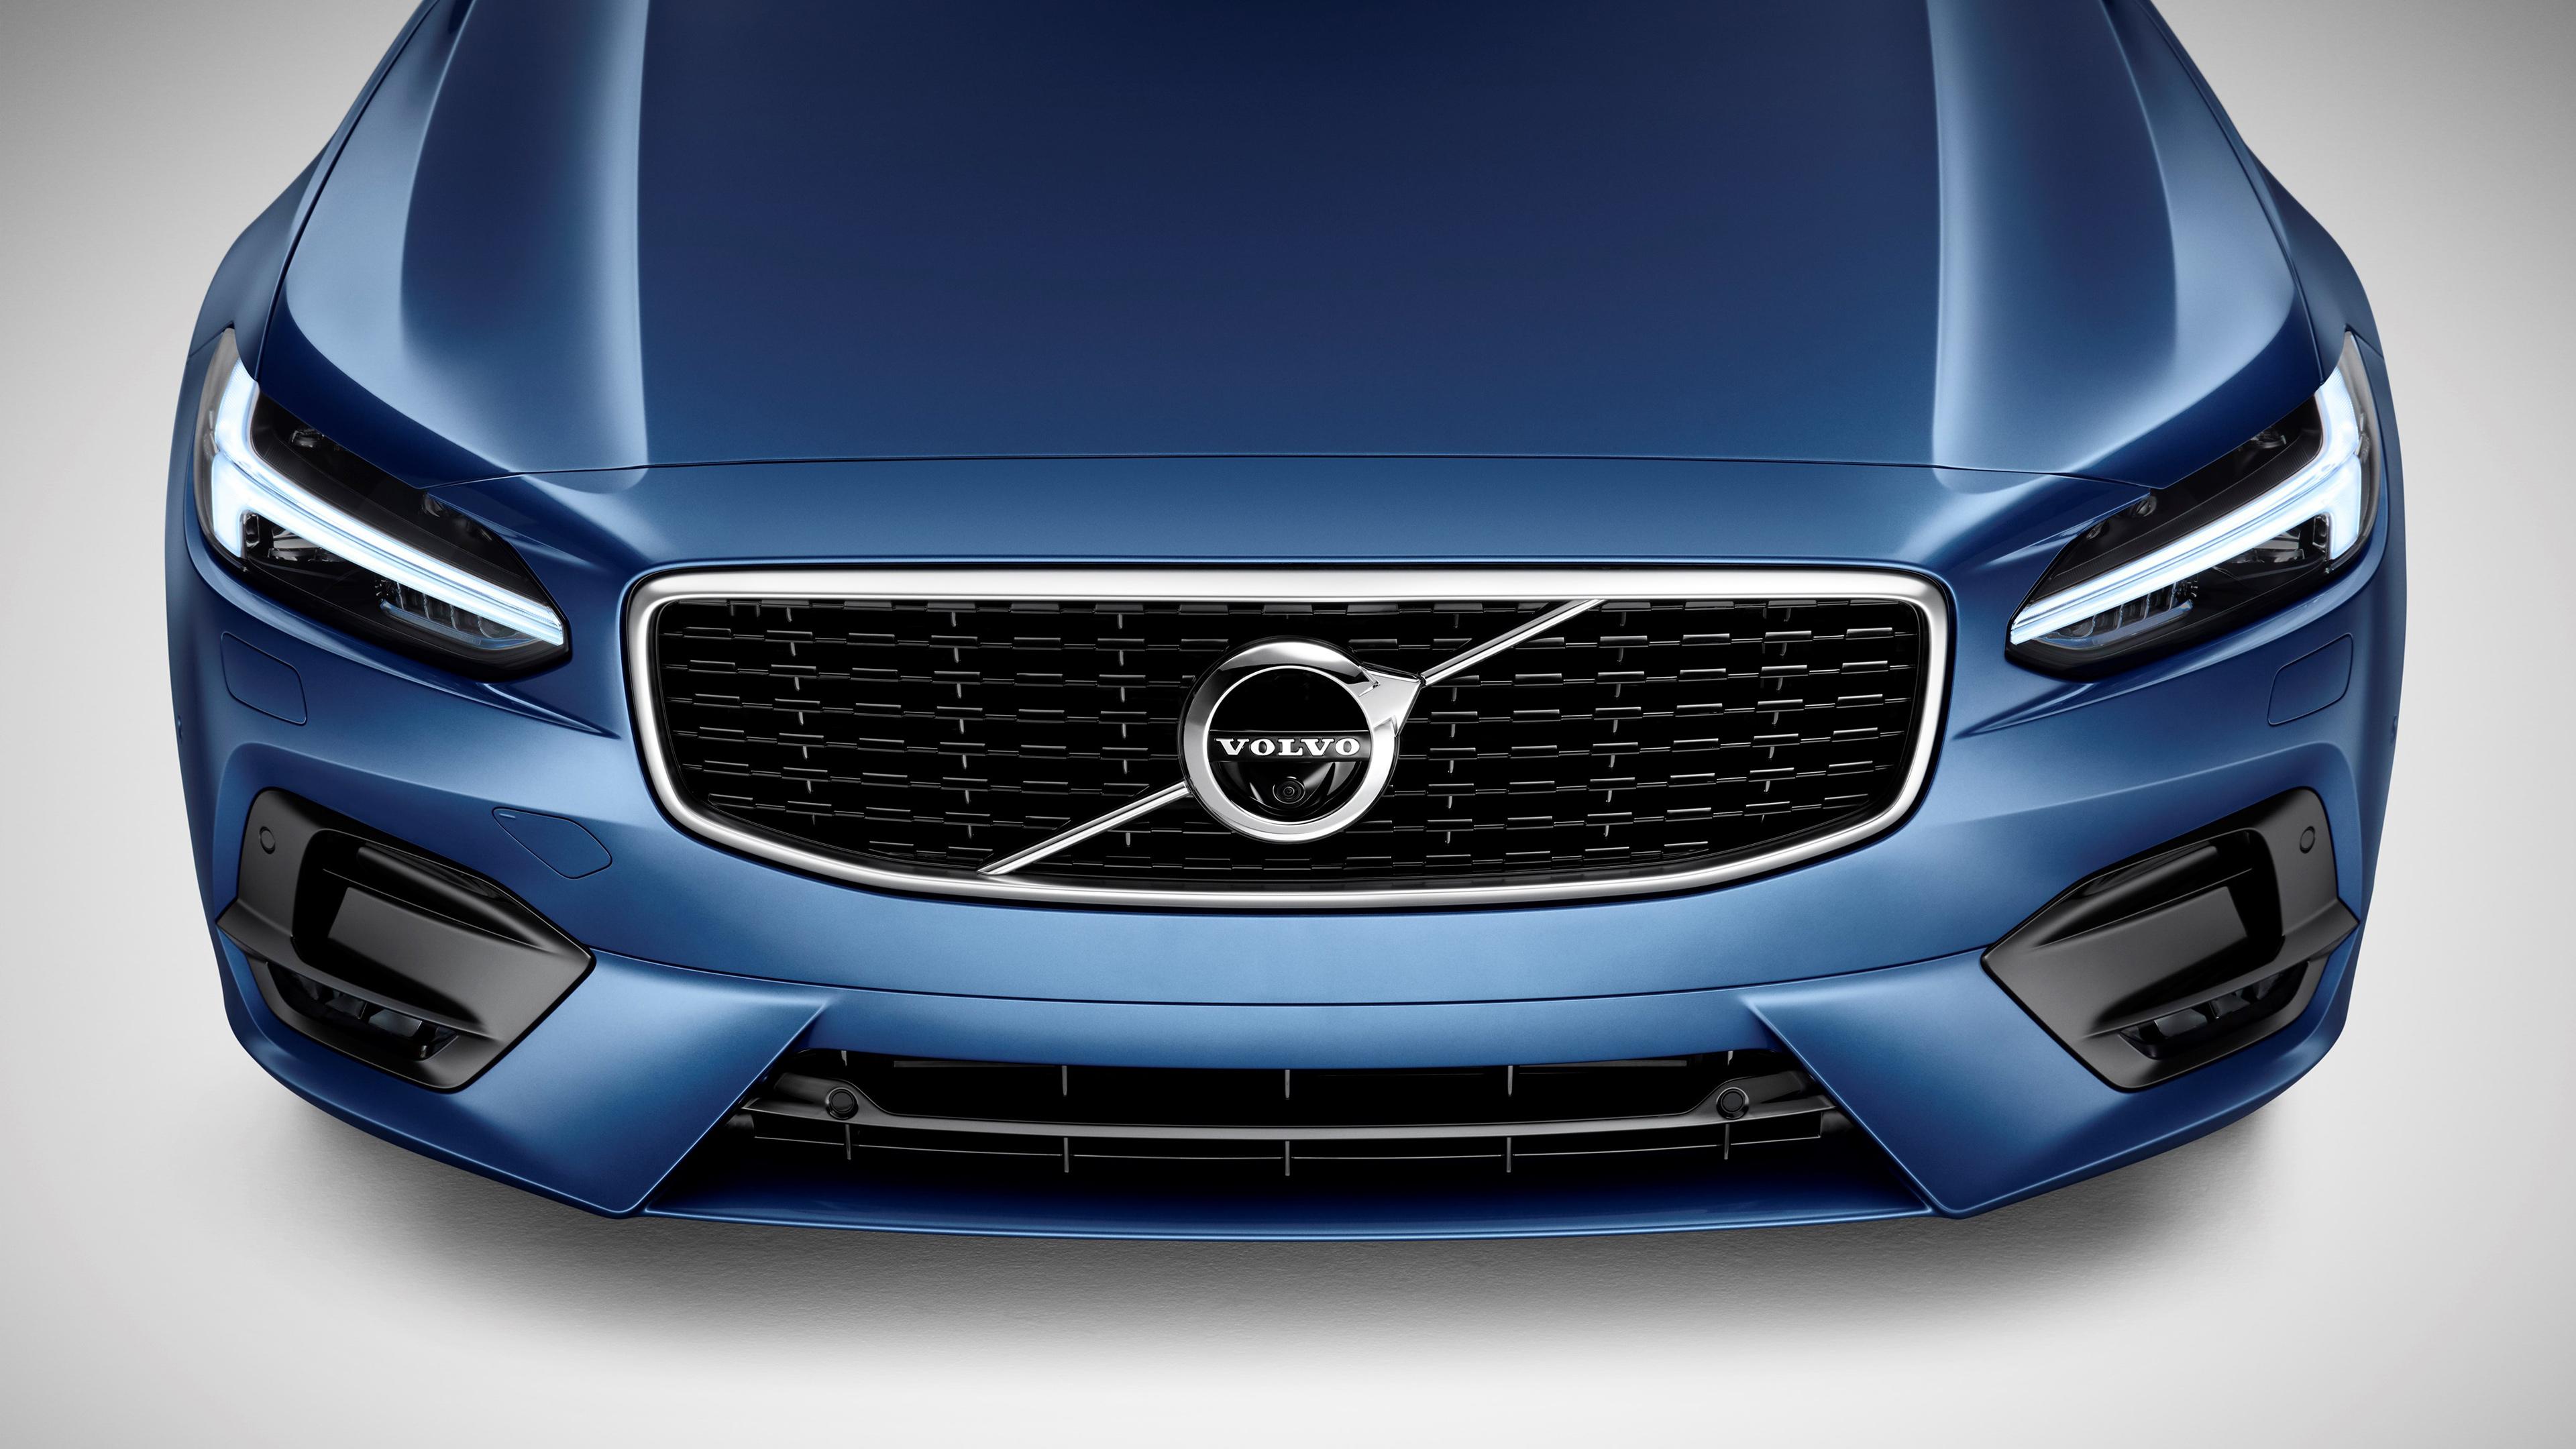 2016 Volvo V70 R 3 Wallpaper HD Car Wallpapers ID 6684 3840x2160